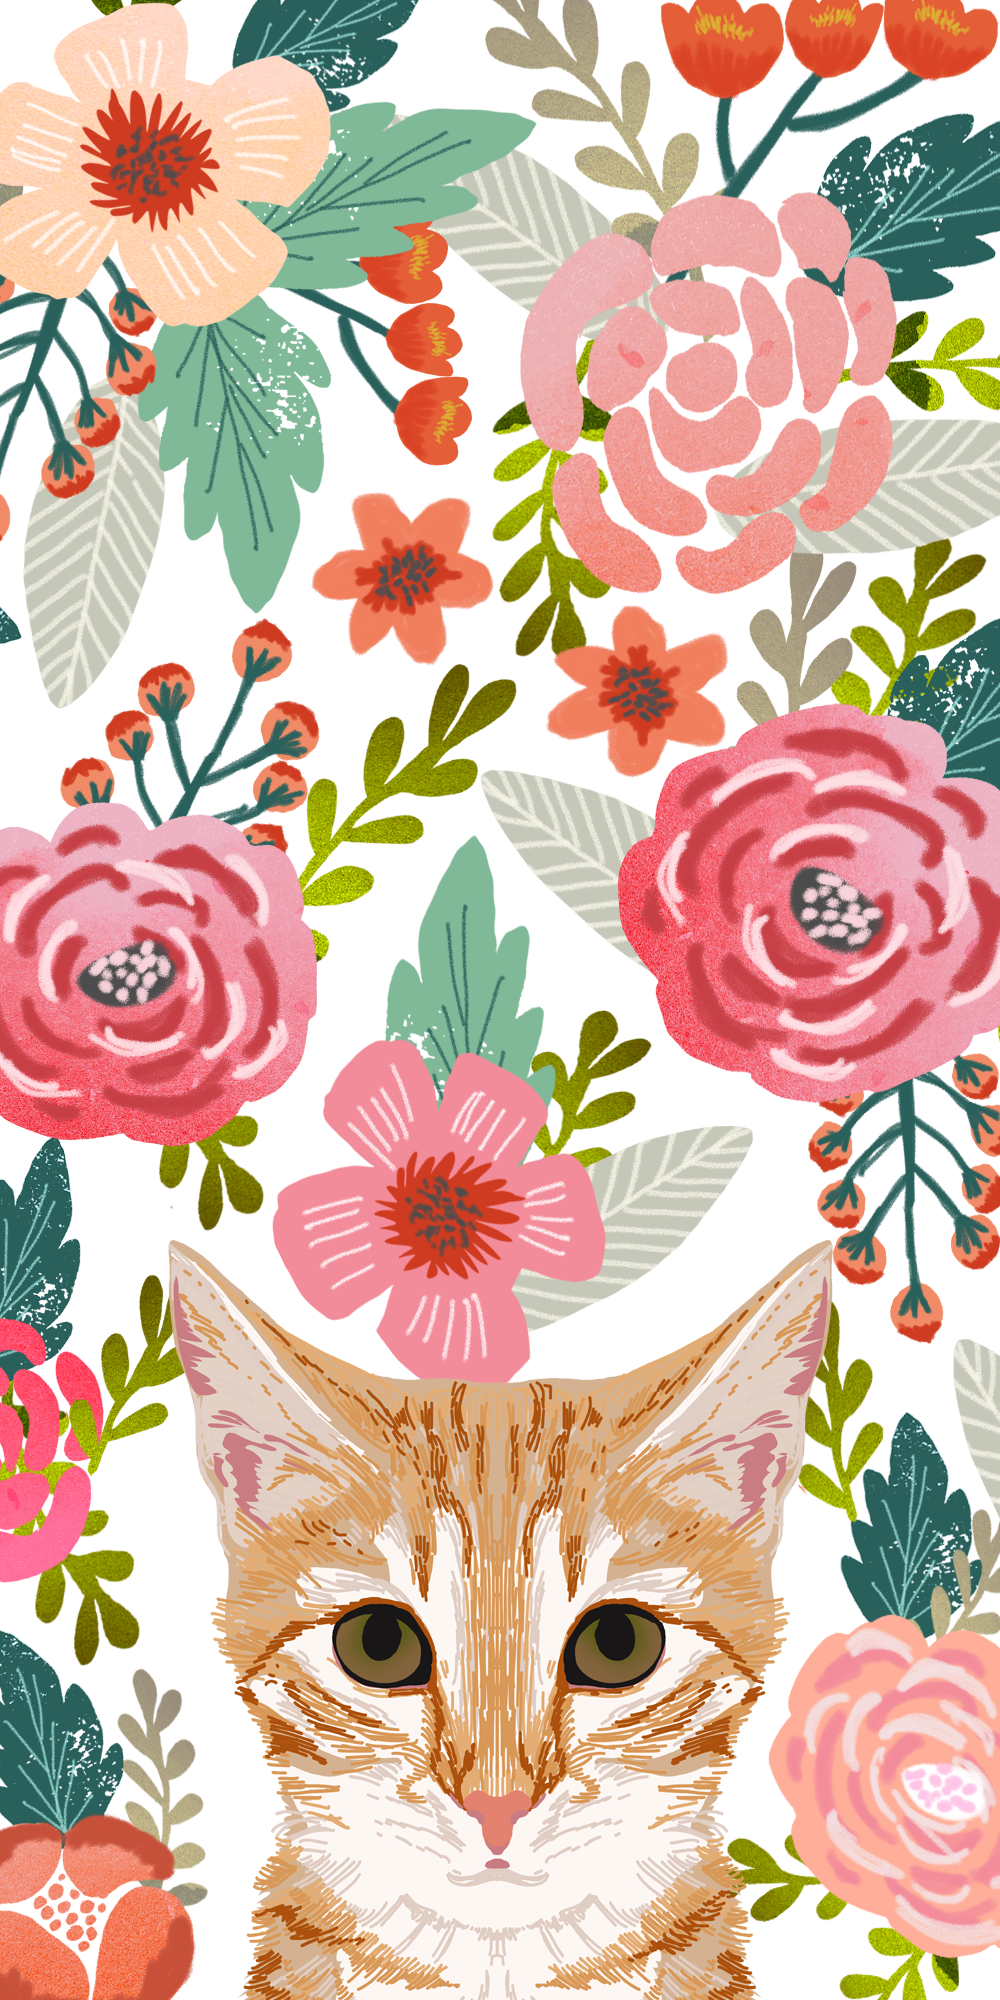 Cats Floral Crown Casetify Iphone Art Design Animals Wallpaper Ideas Cat Phone Wallpaper Art Wallpaper Iphone Wallpaper Cat